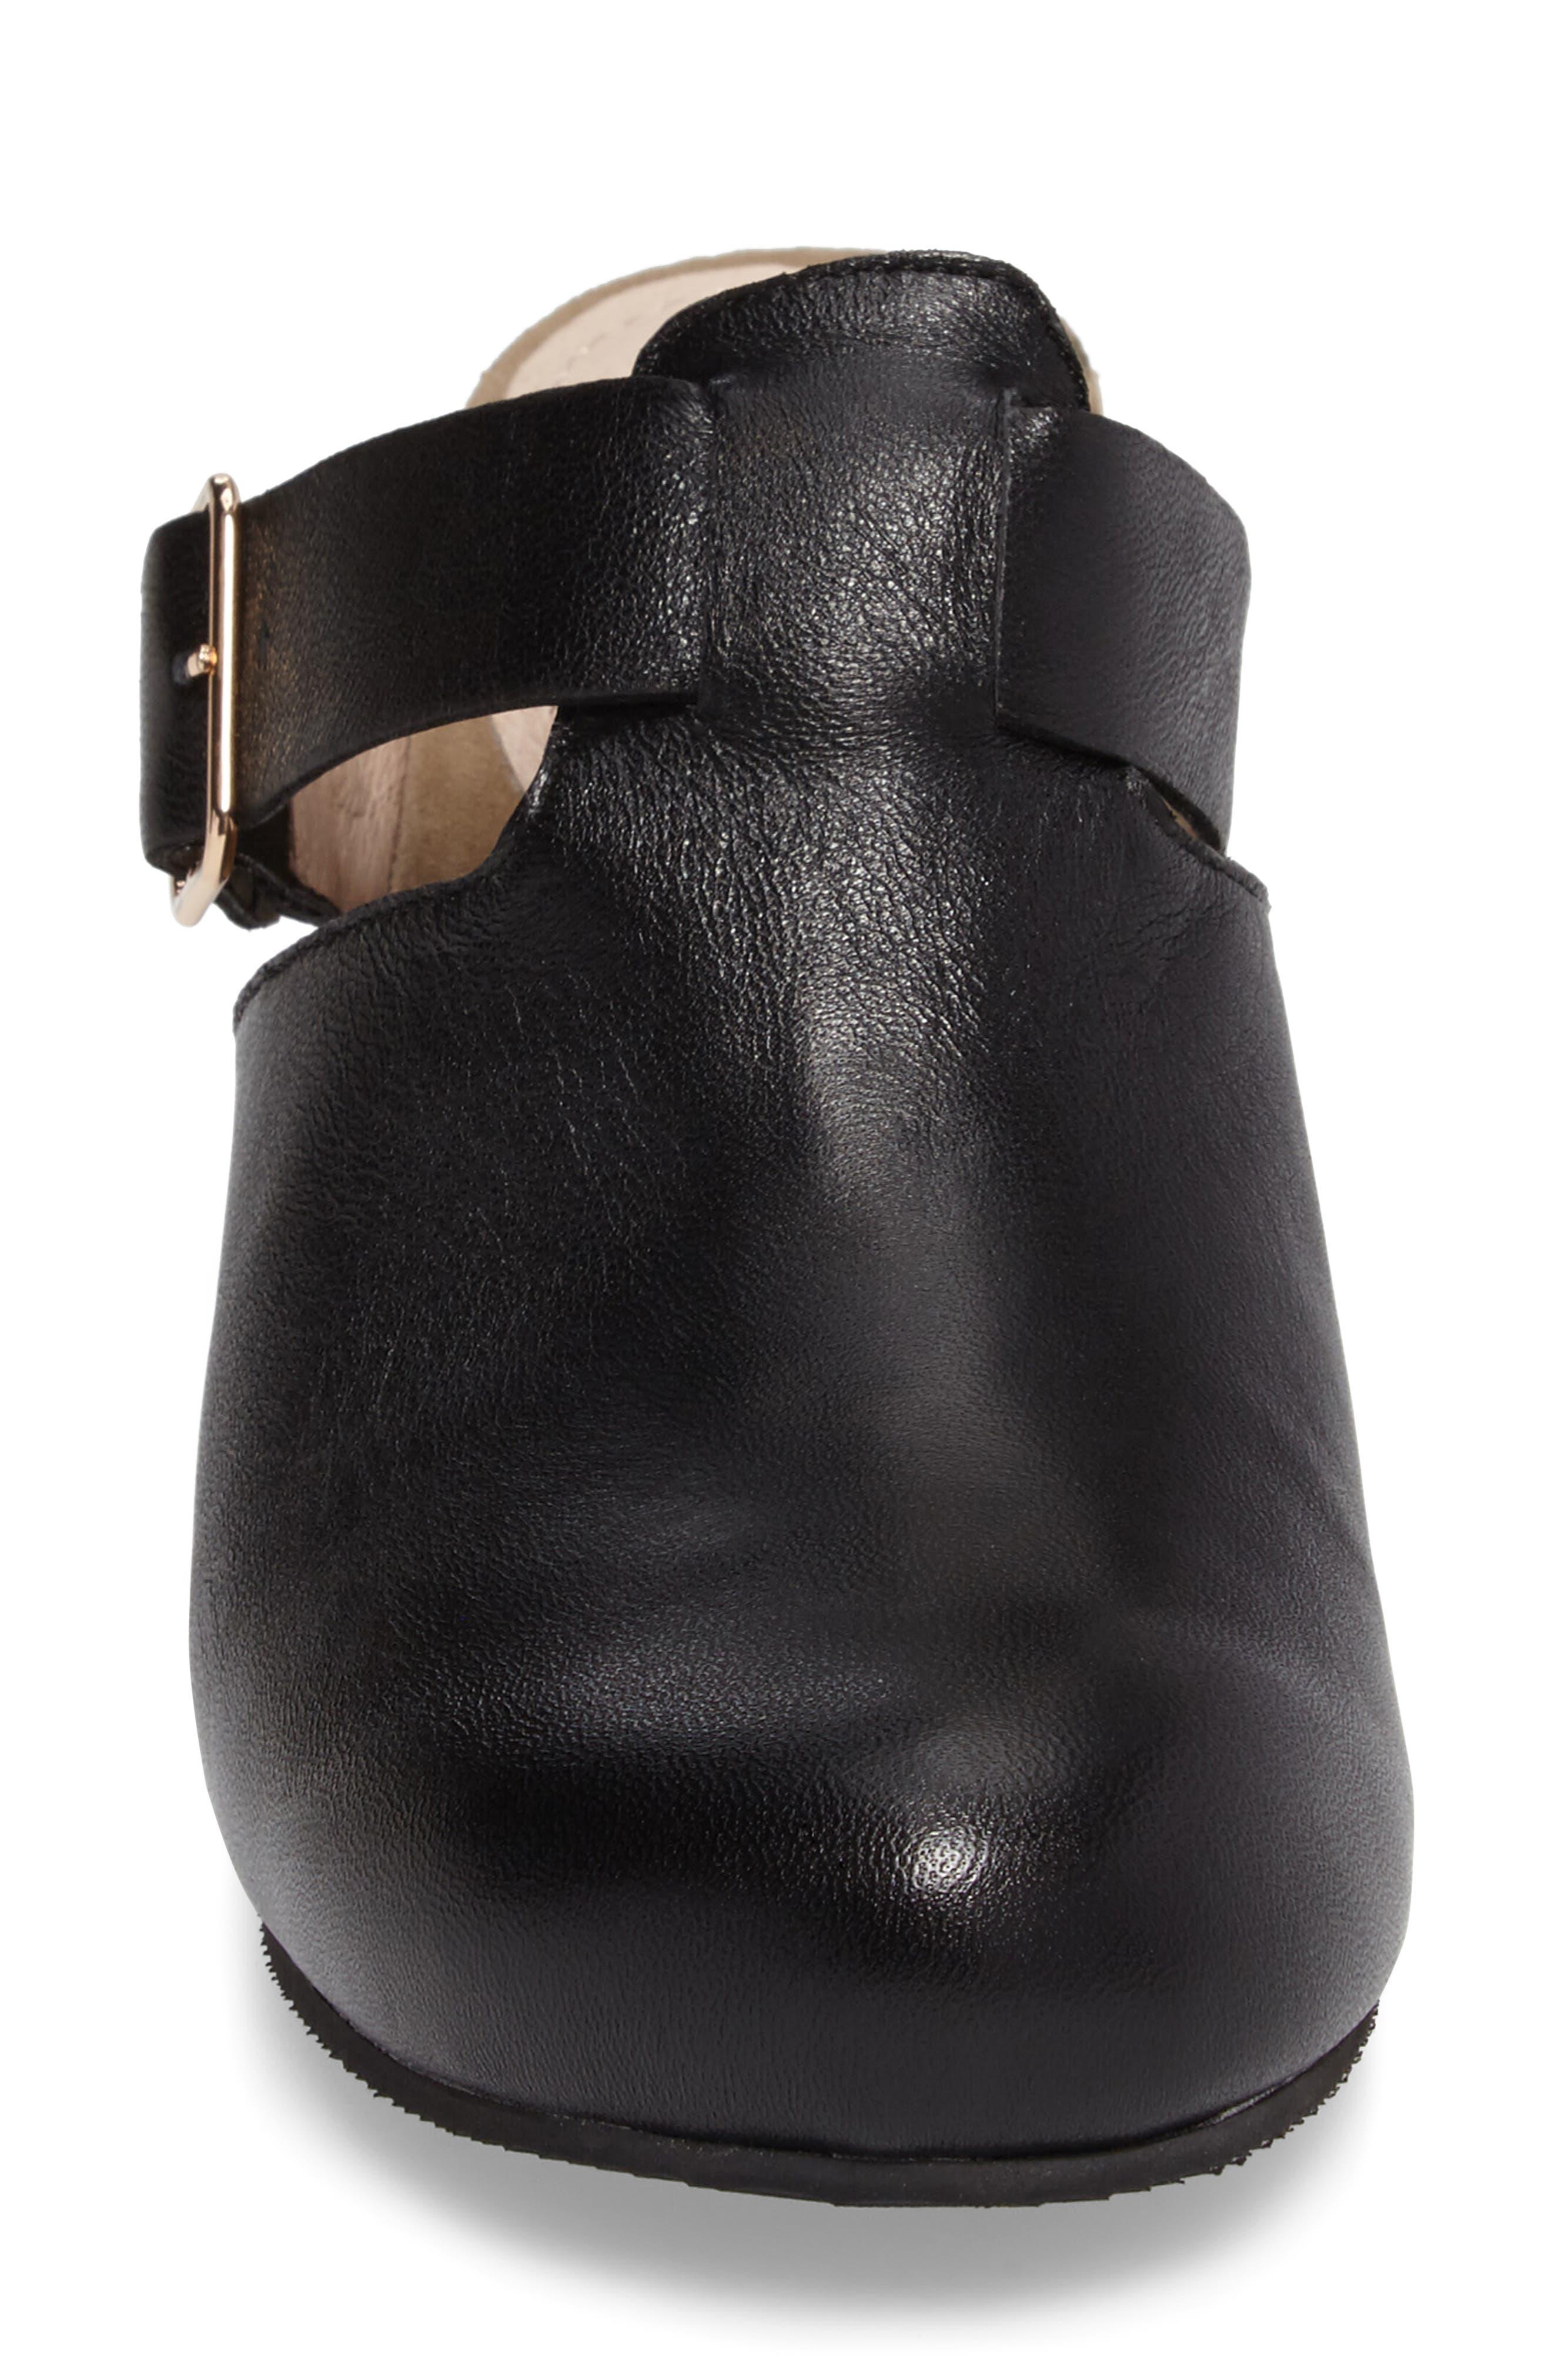 Cindy Block Heel Mule,                             Alternate thumbnail 4, color,                             Black Leather